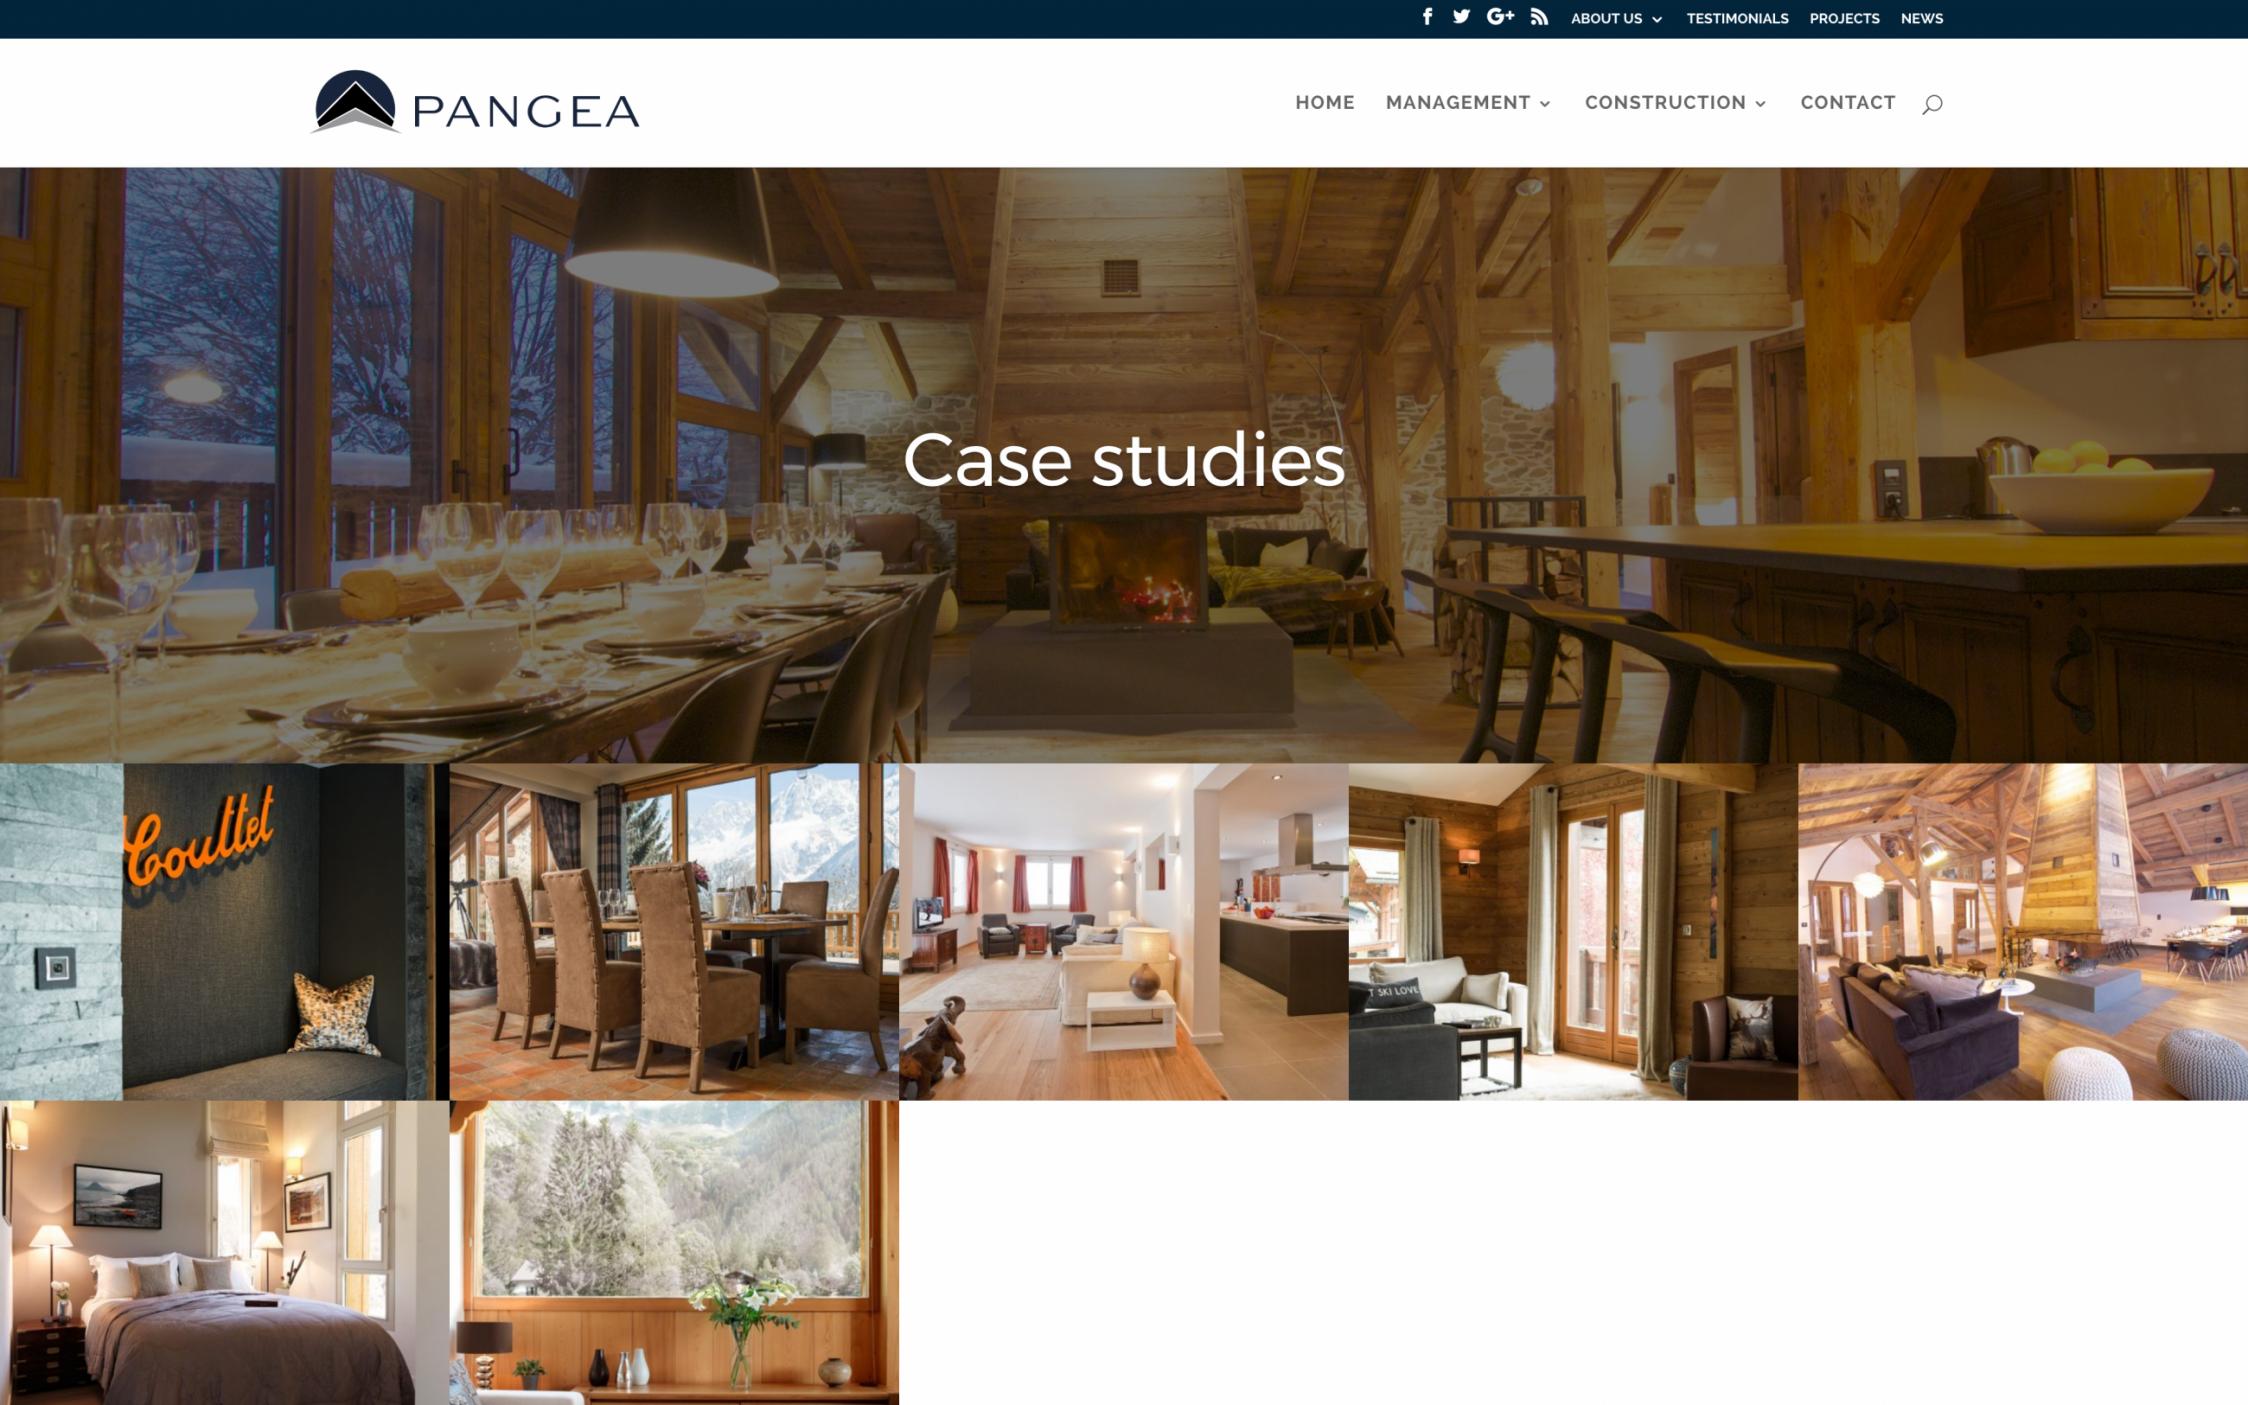 Screen Shot 2017 03 05 at 16.56.32 - Property management company website design